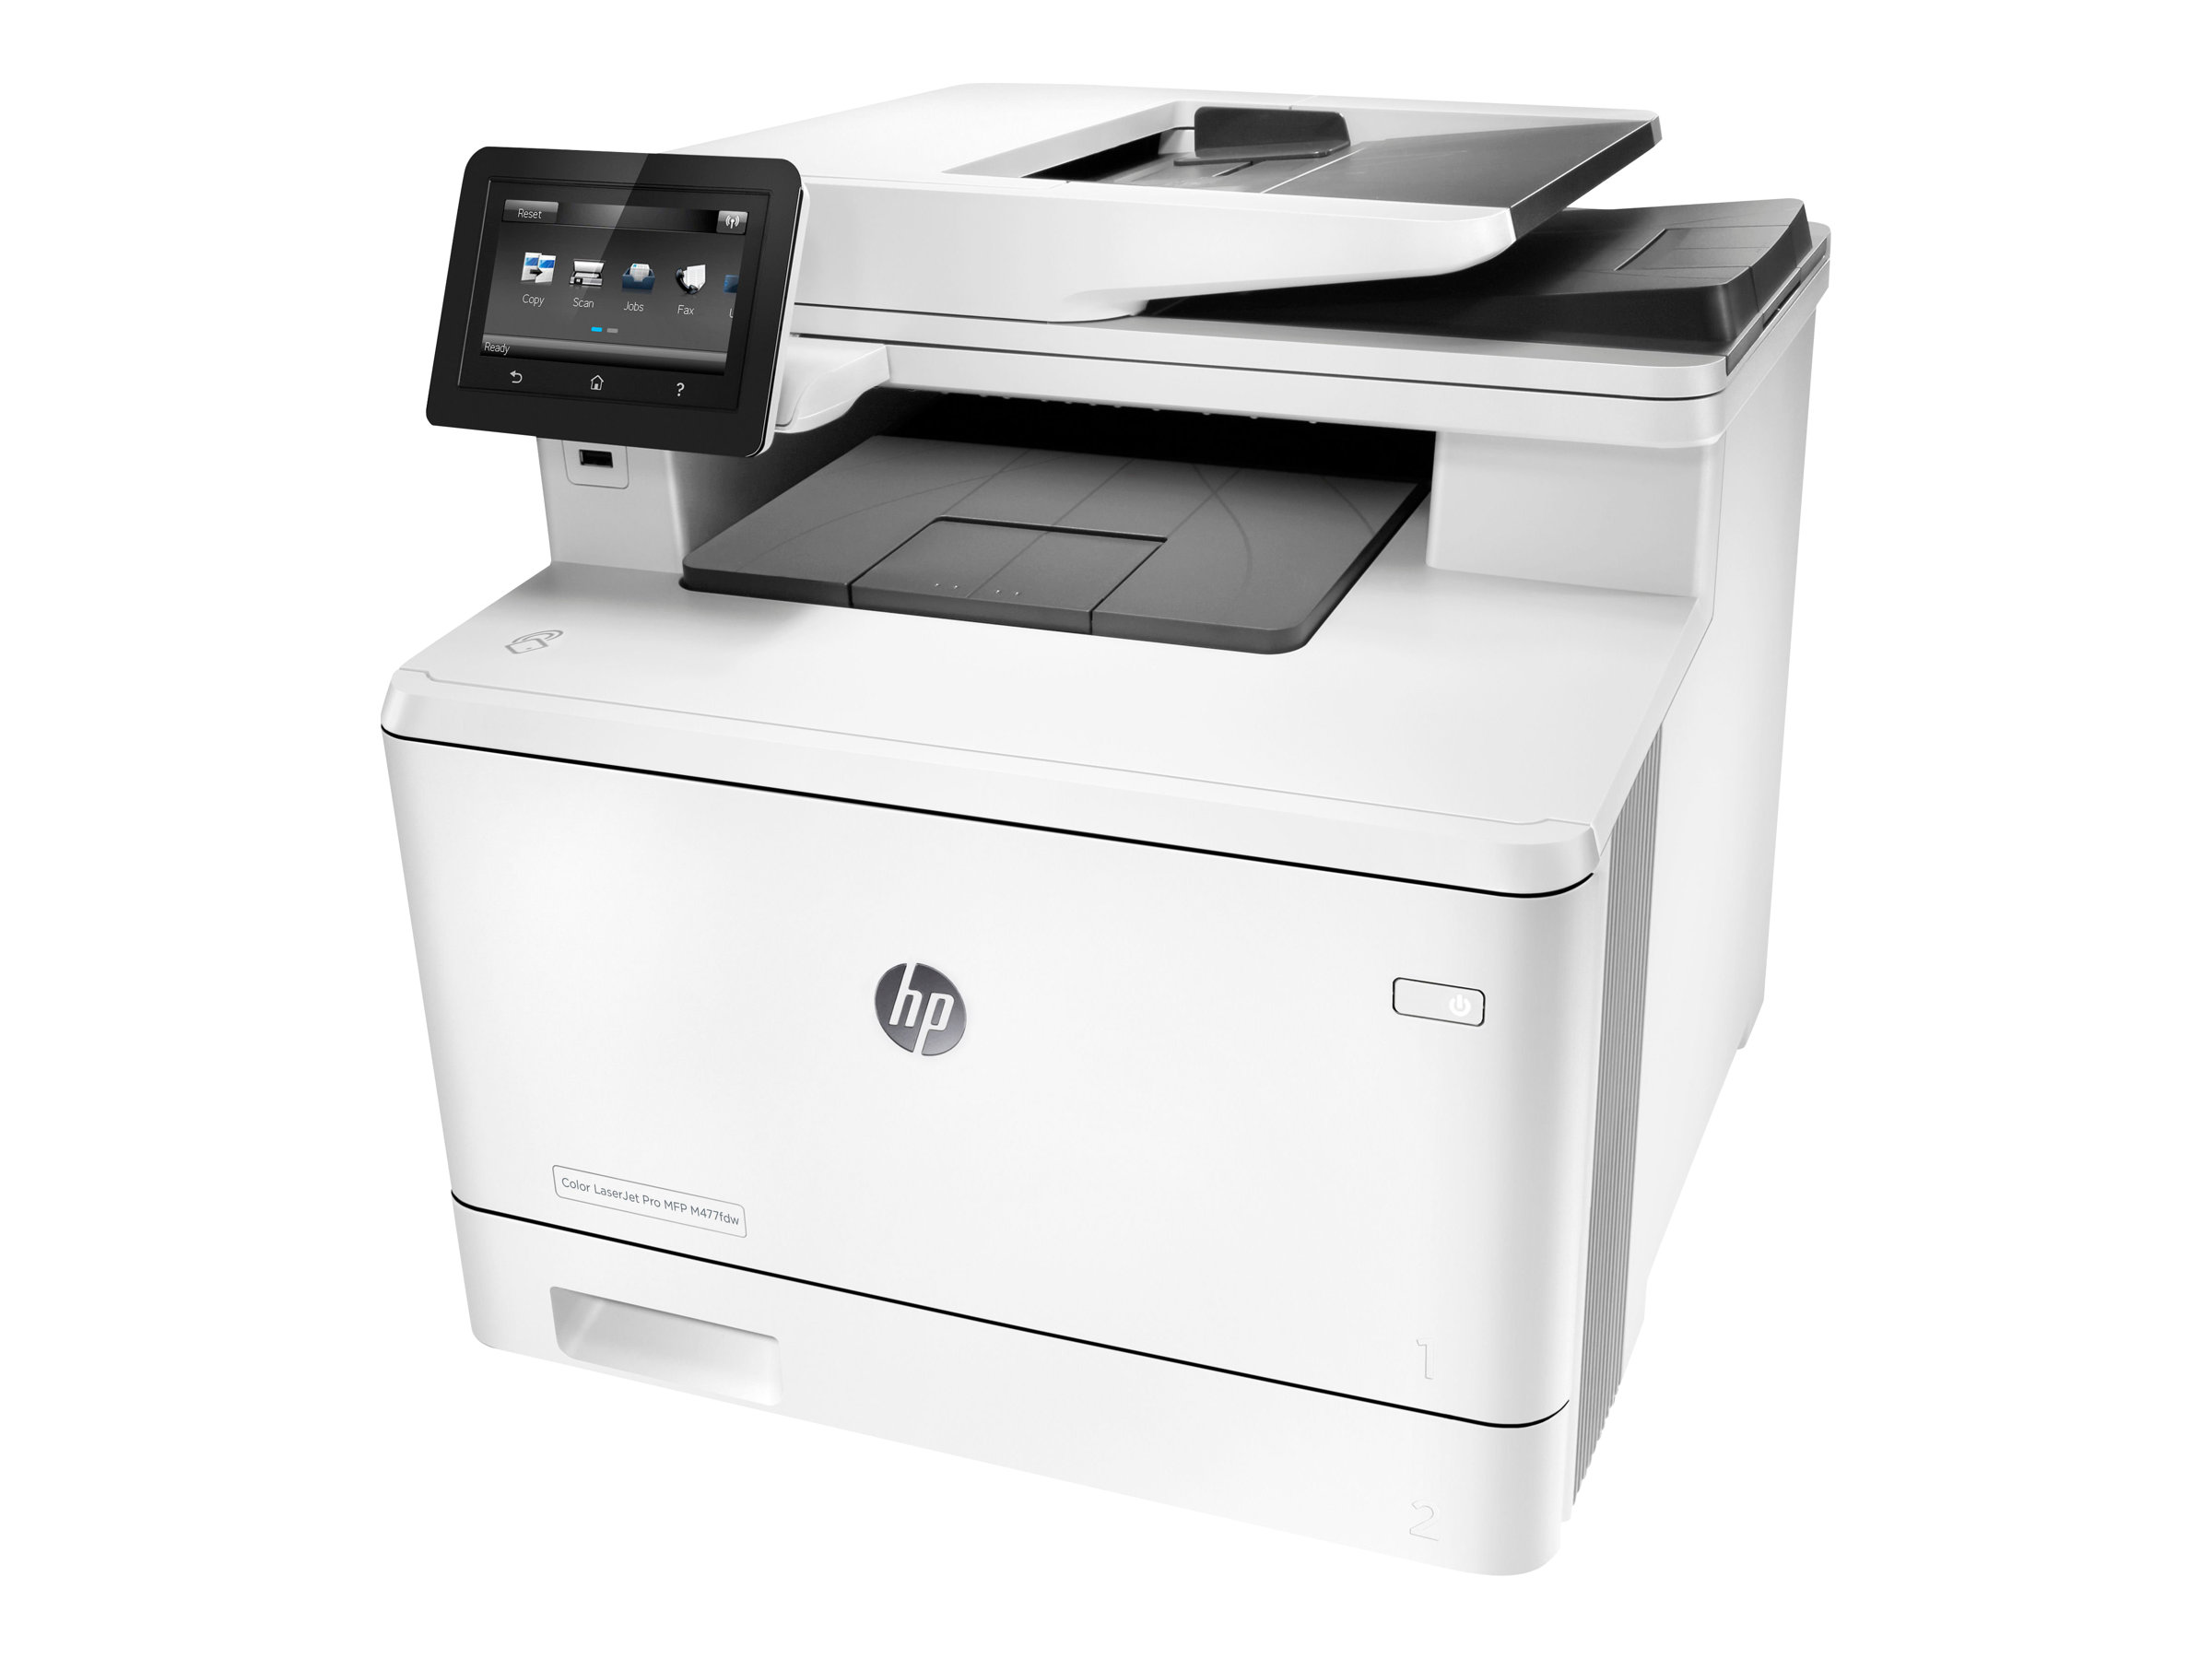 HP Color LaserJet Pro M477fdw, Farblaser, MFP, A4